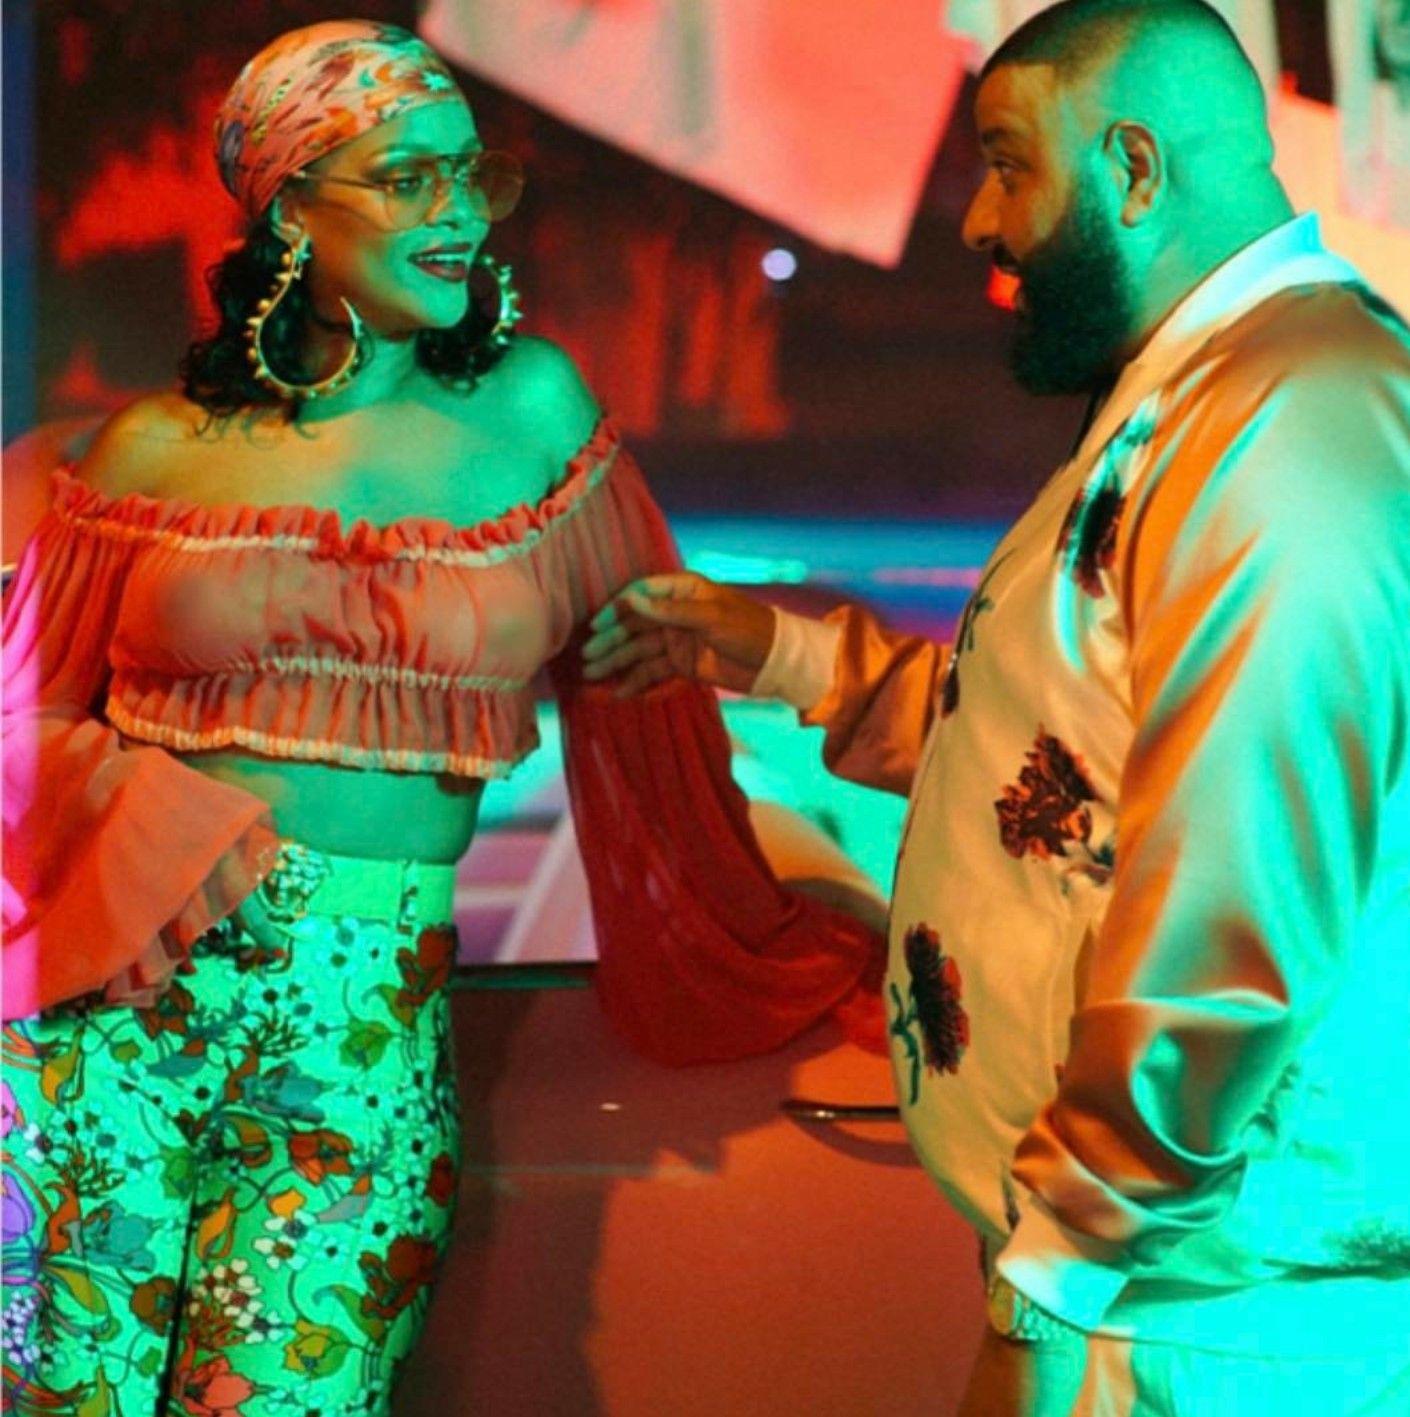 f01c55e860 🅱️LEU❤️R🅾️SES #💋WildThoughts Dj Khaled's Wife, Rihanna You,